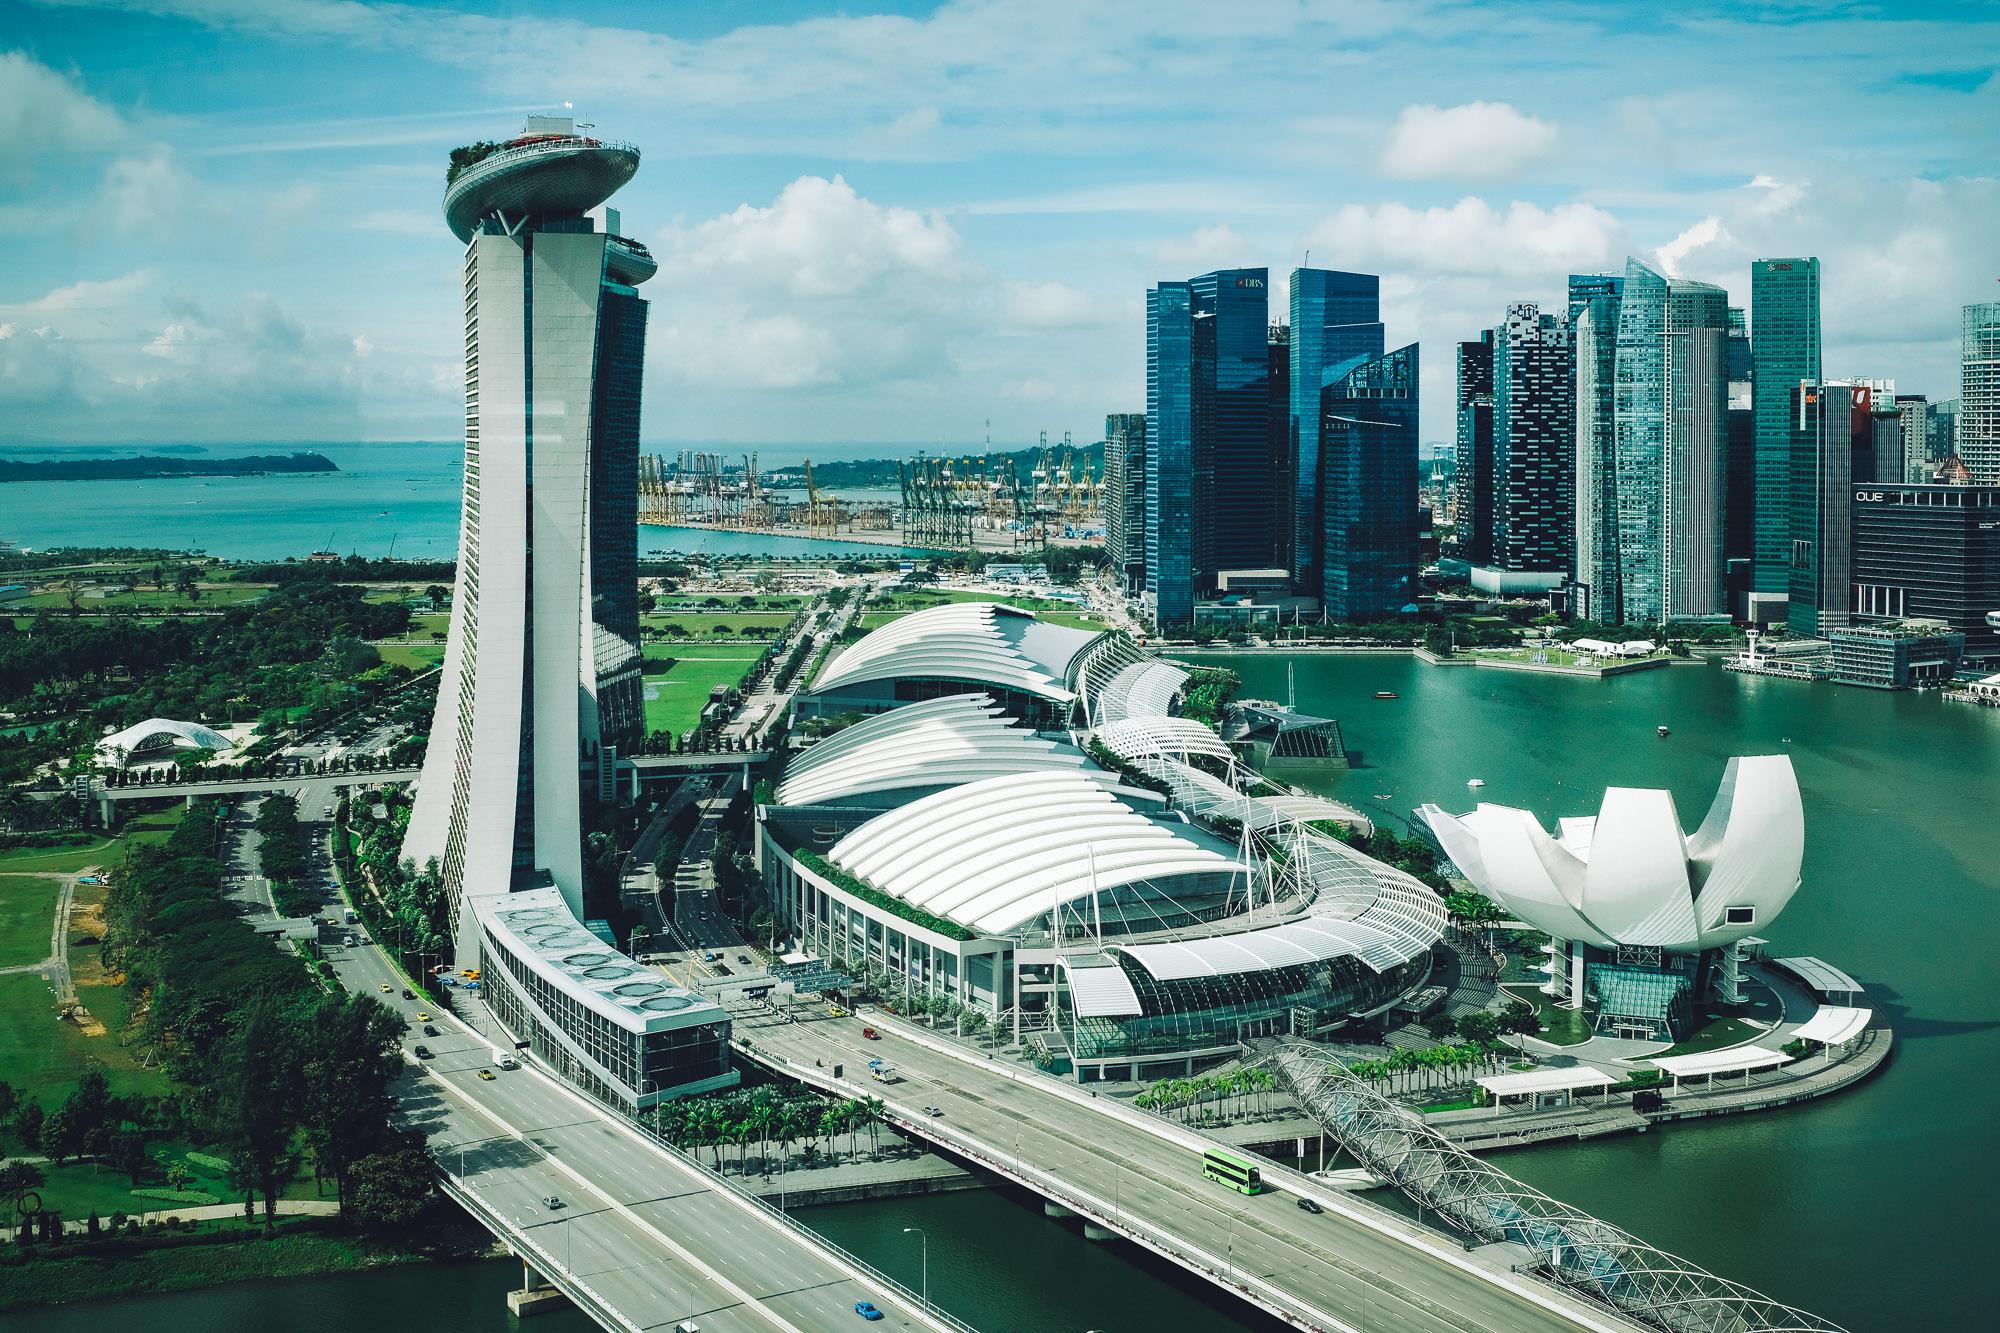 170302-singapore-101910-instagram.jpg